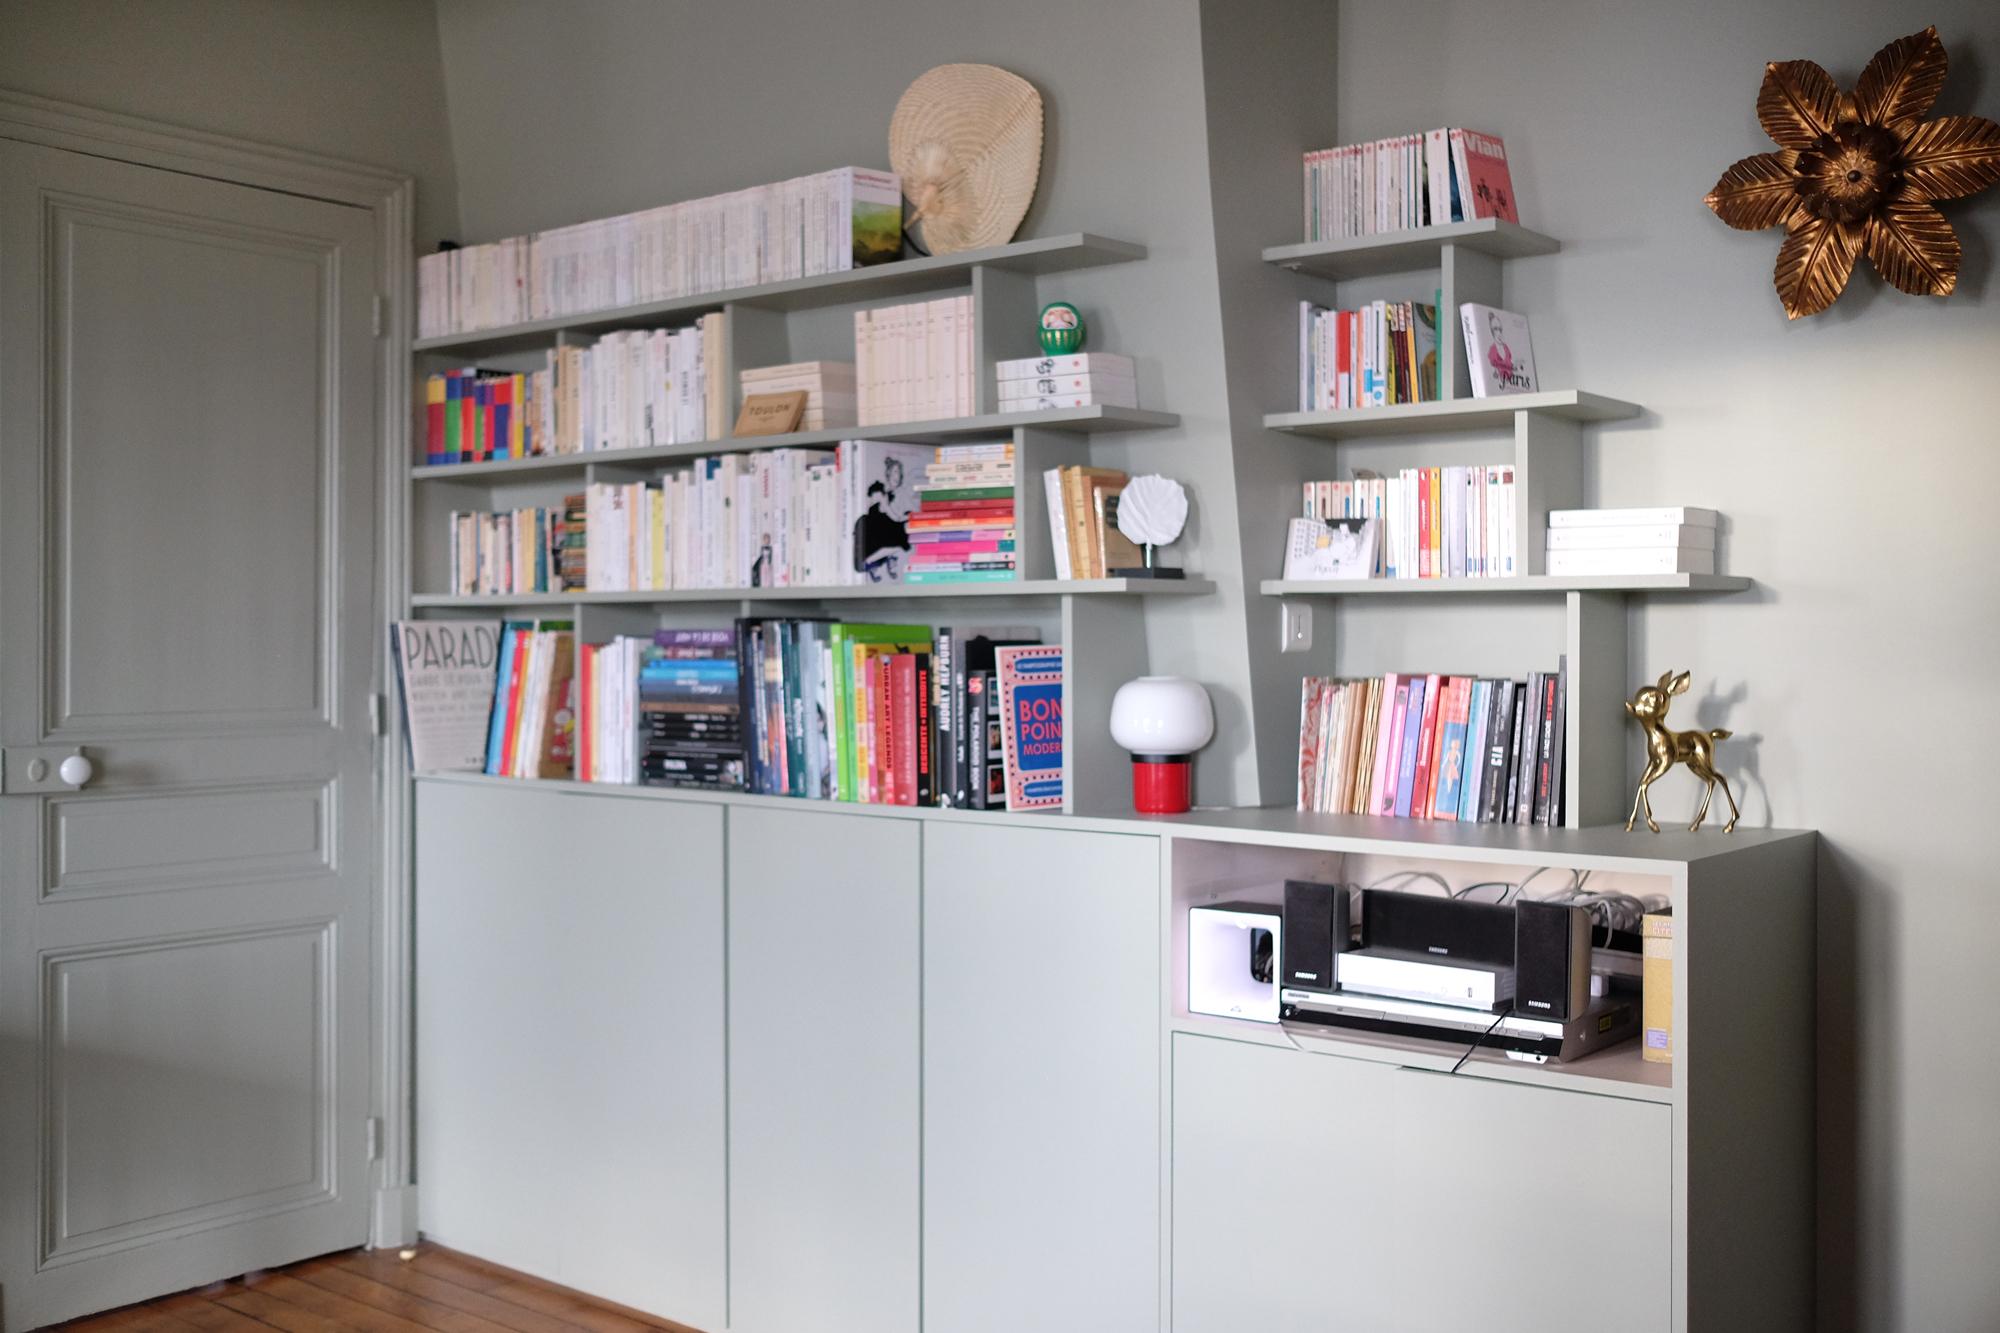 Coût Bibliothèque Sur Mesure une bibliothèque sur mesure : le tuto ! – deedee